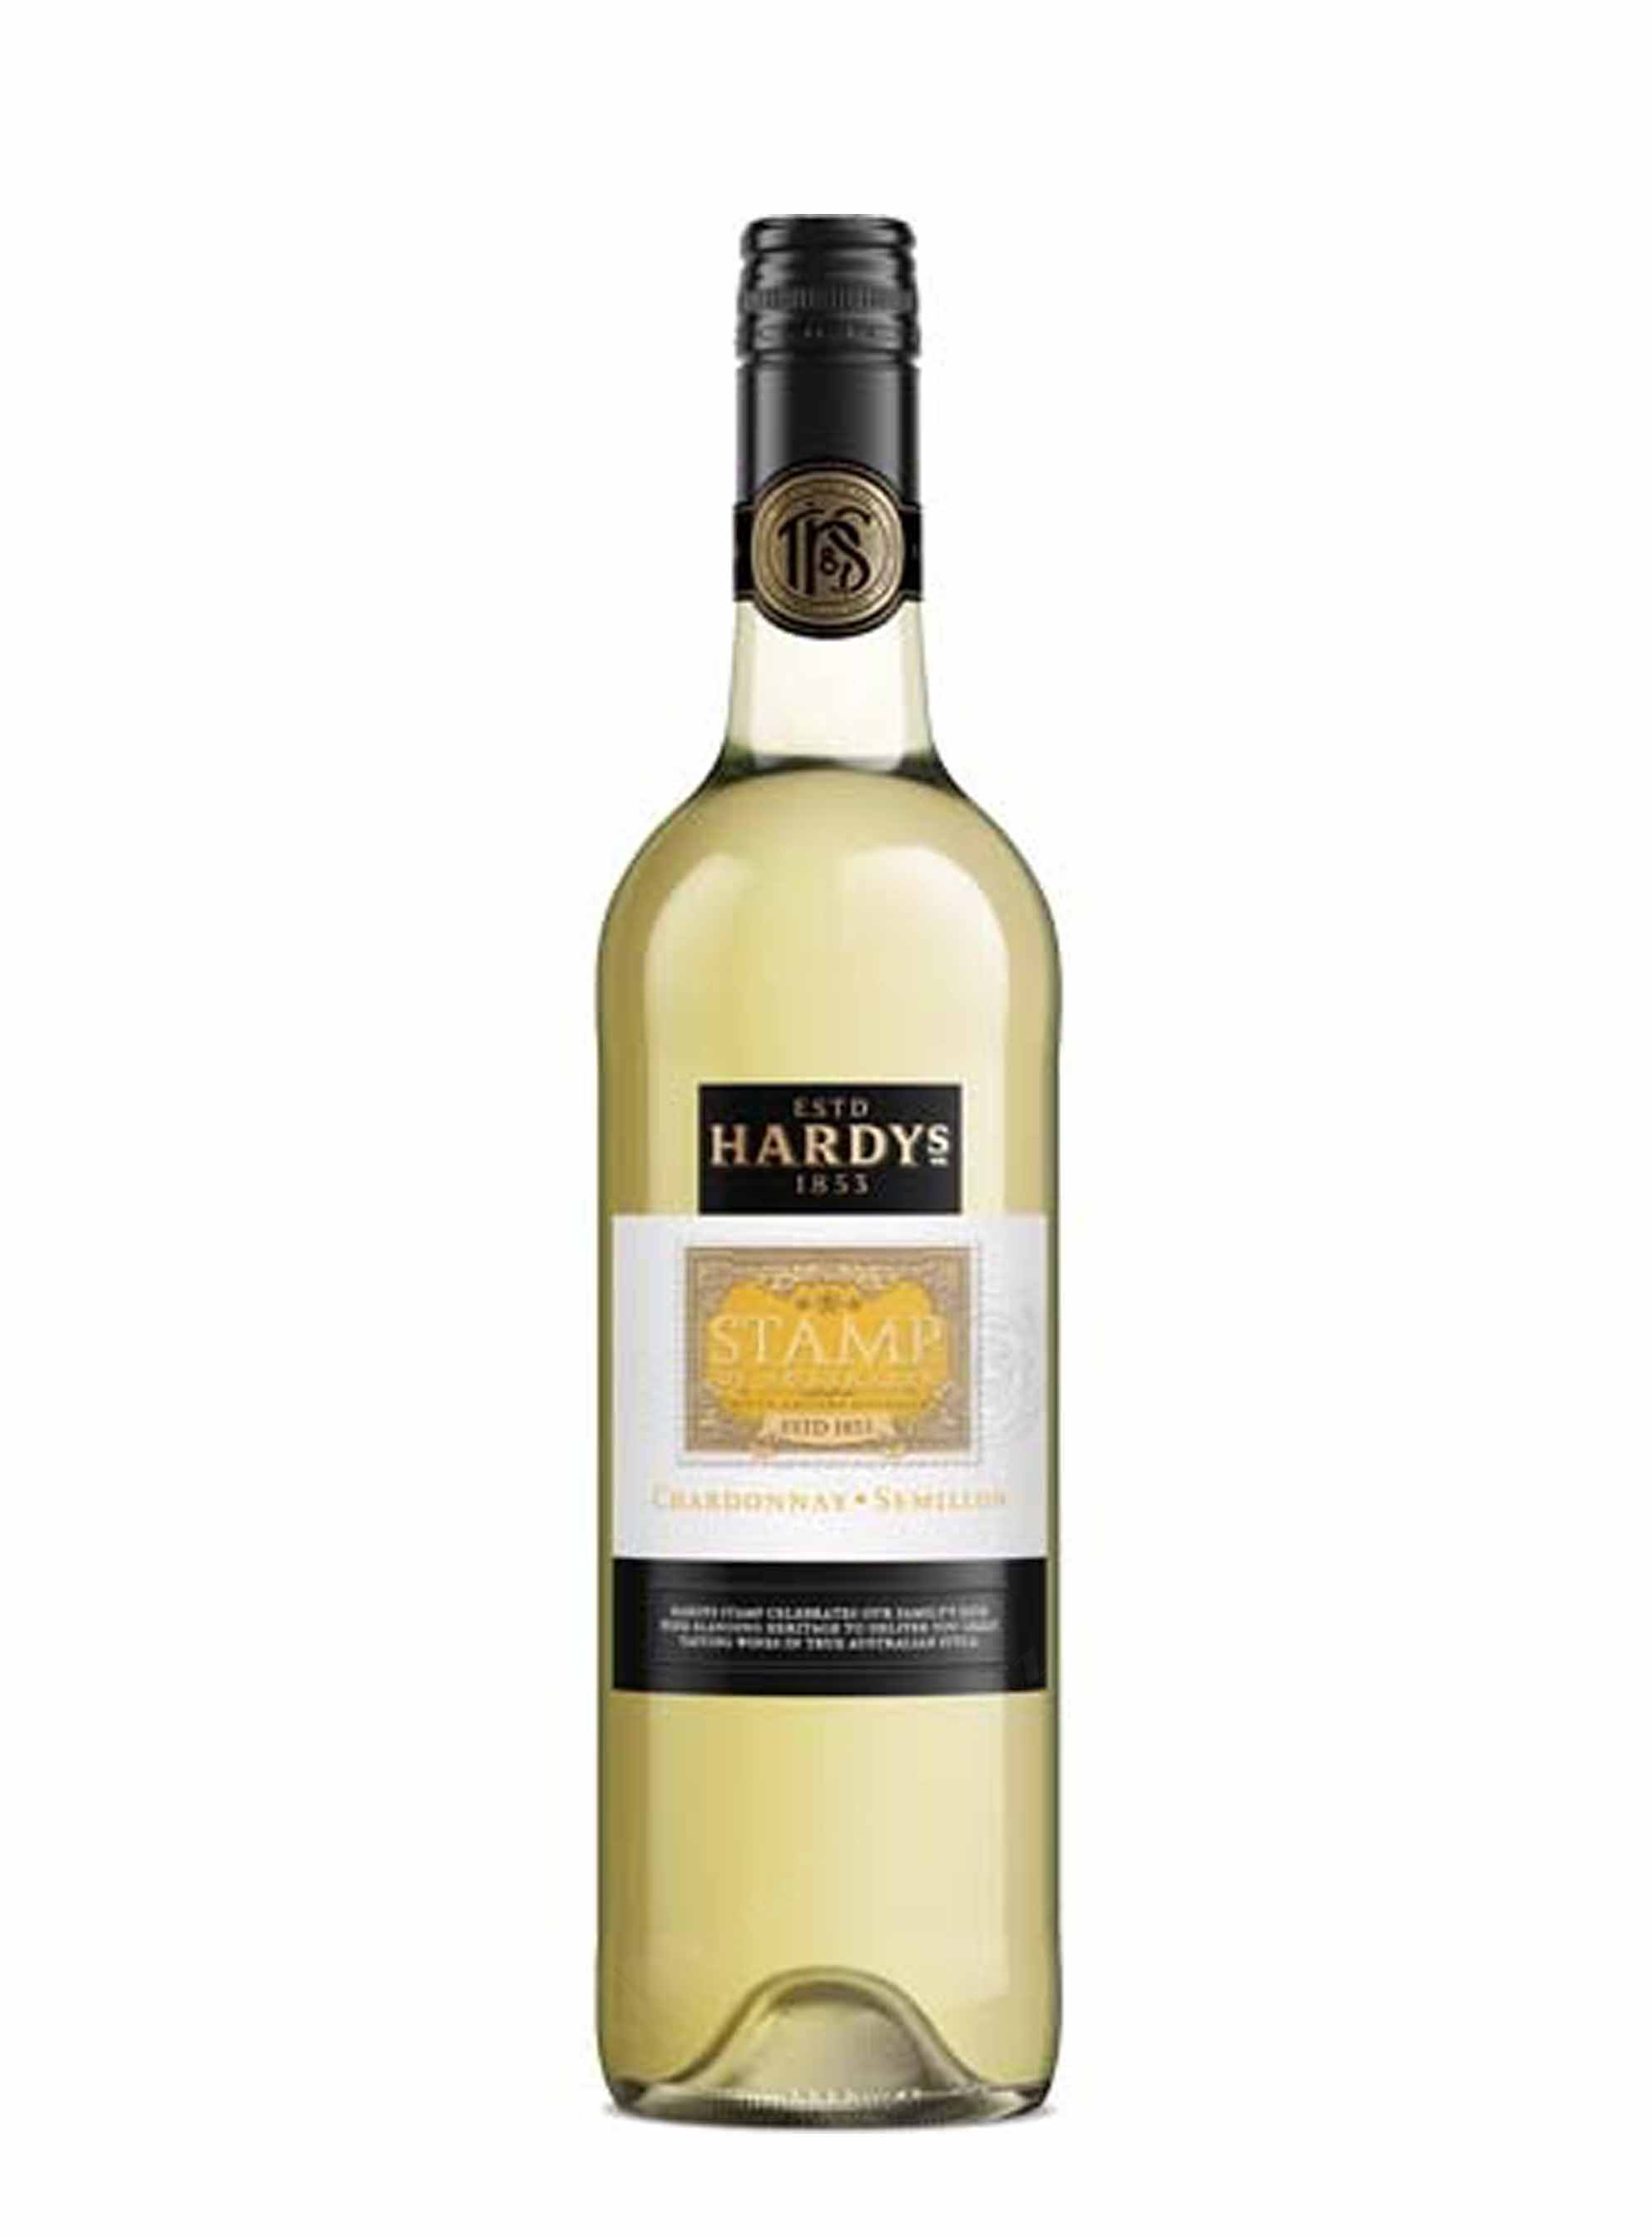 Cuvée, Stamp, 2014, Hardys, 0.75 l